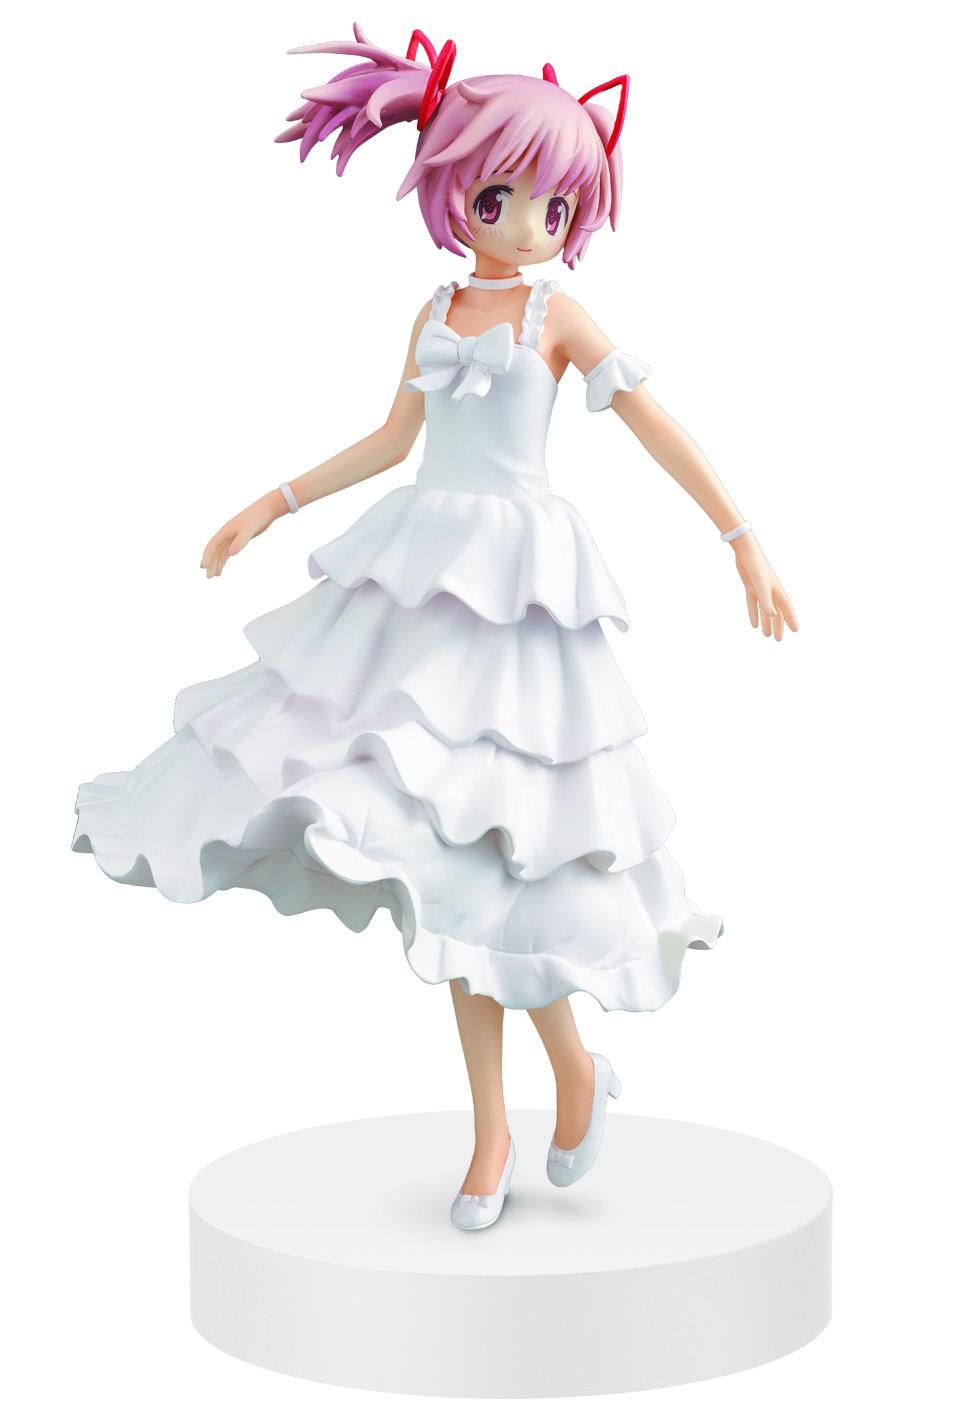 Link a Madoka Kaname White Dress Ver. –  SQ